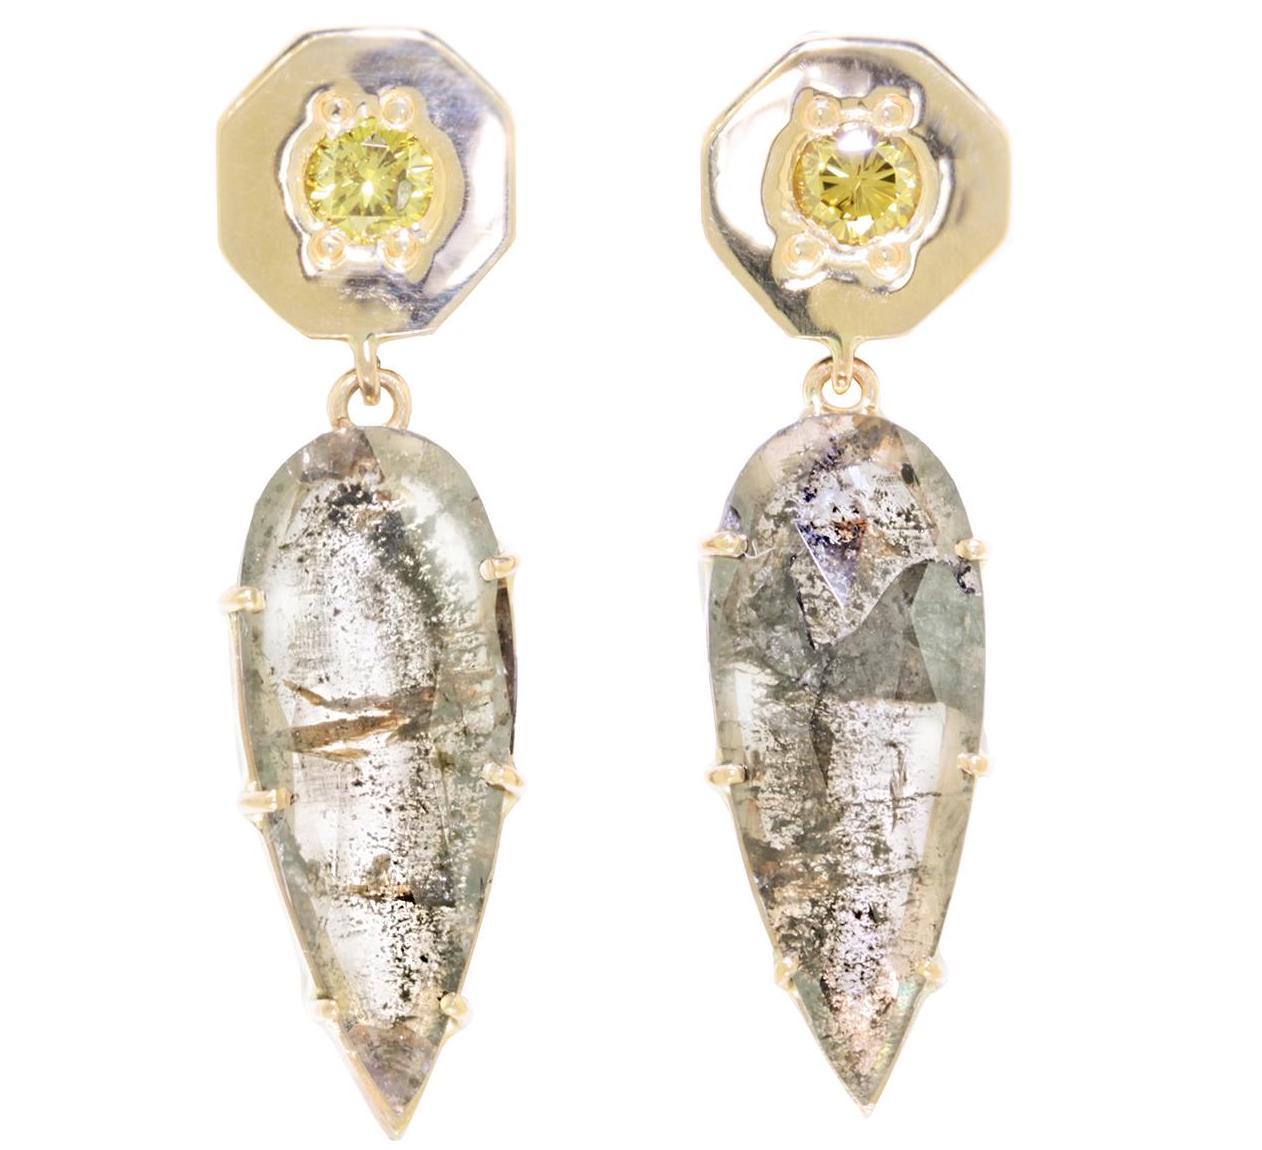 Chinchar/Maloney Krakatoa earrings | JCK On Your Market